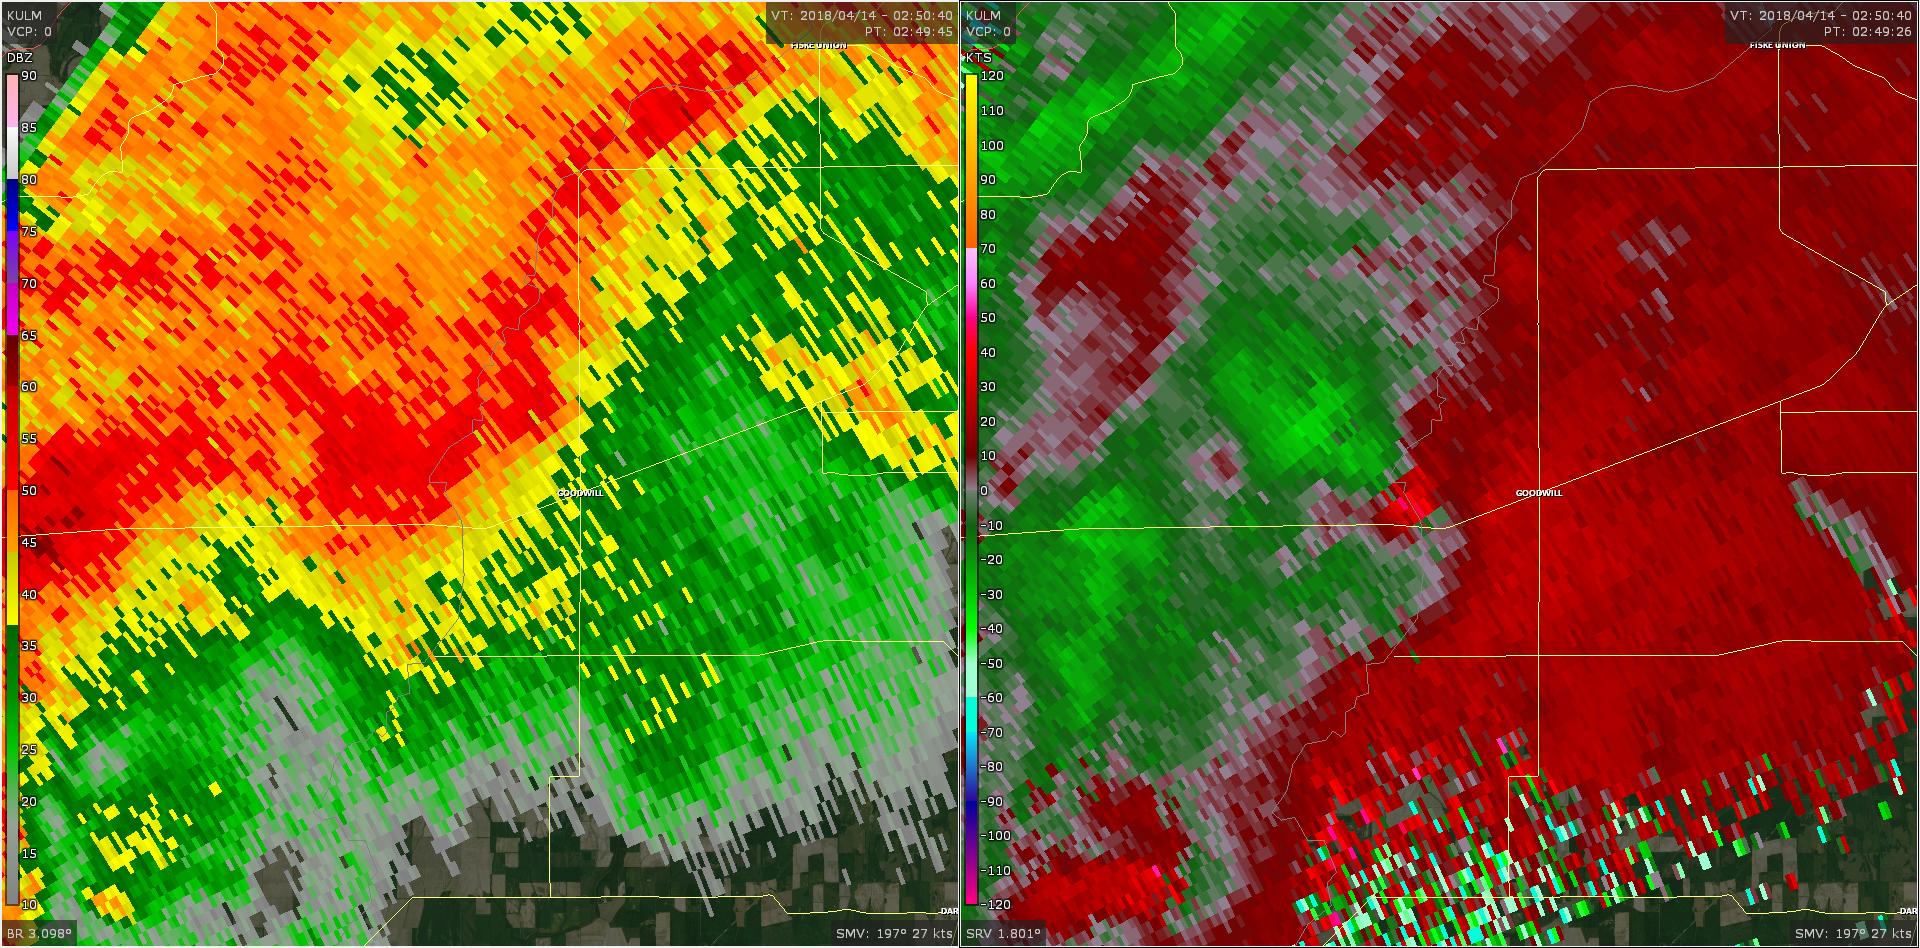 Radar - Morehouse Parish Tornado